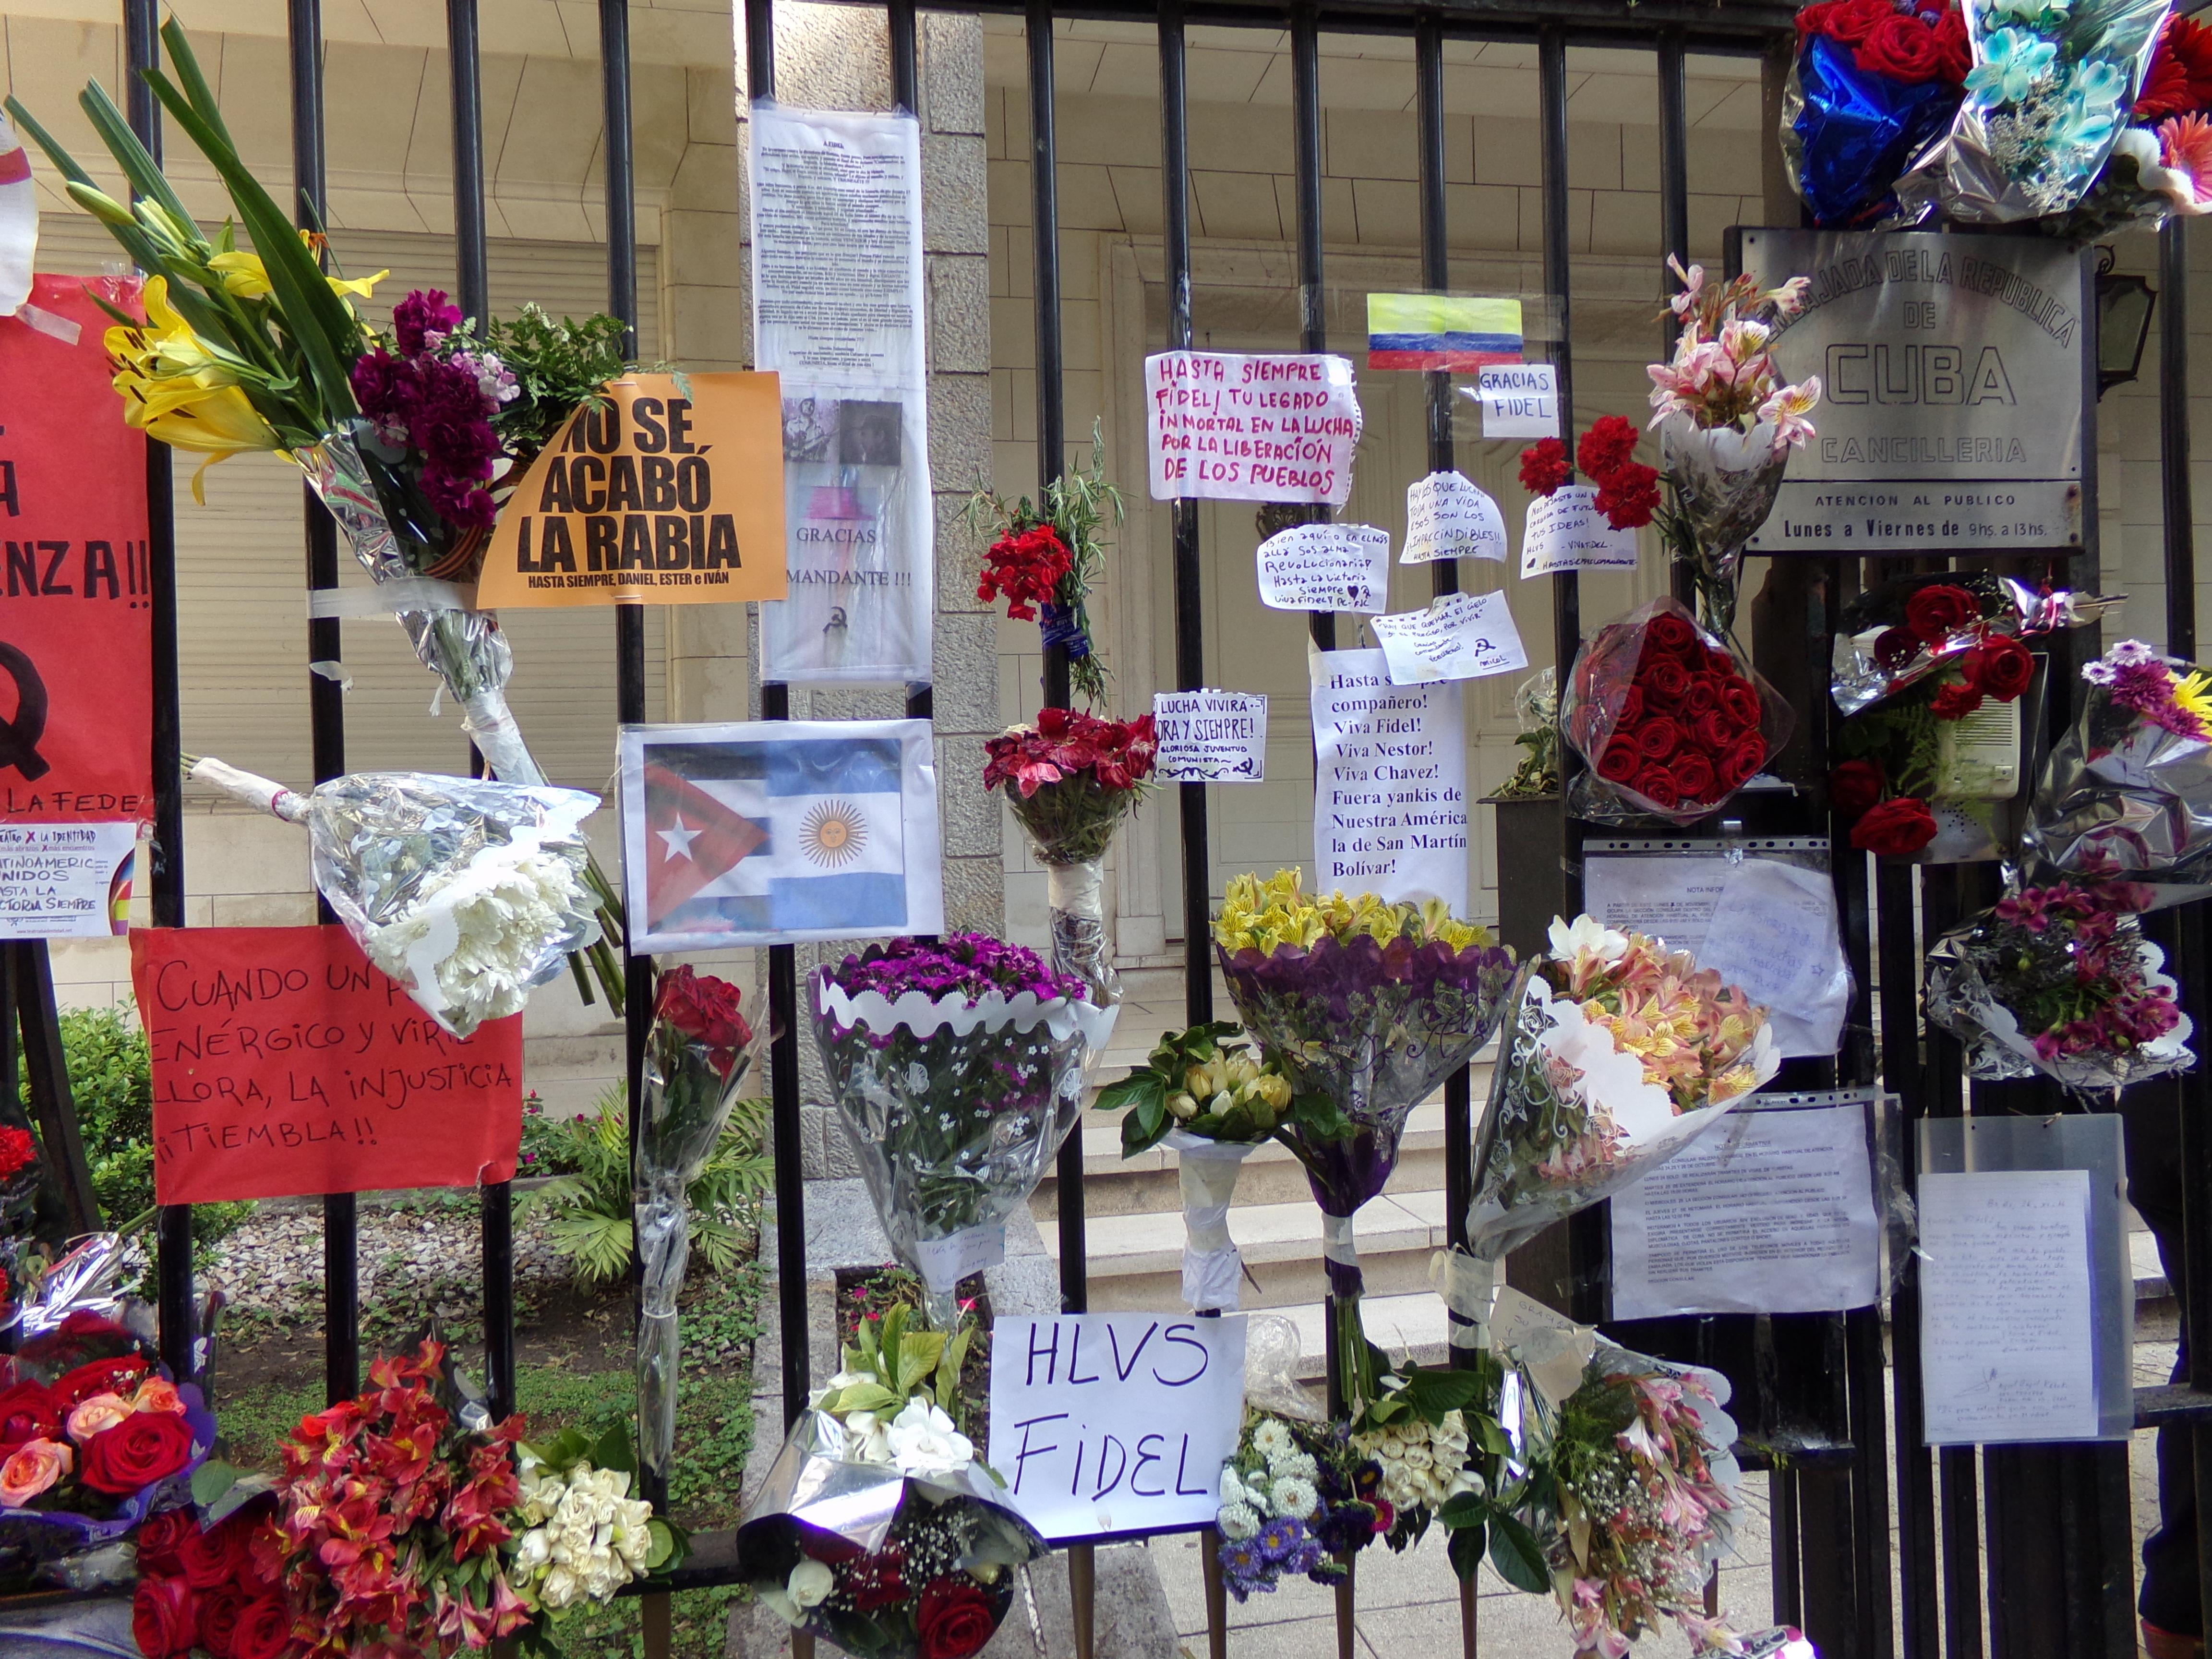 Homenajes a Castro en la embajada cubana en Buenos Aires, Argentina.